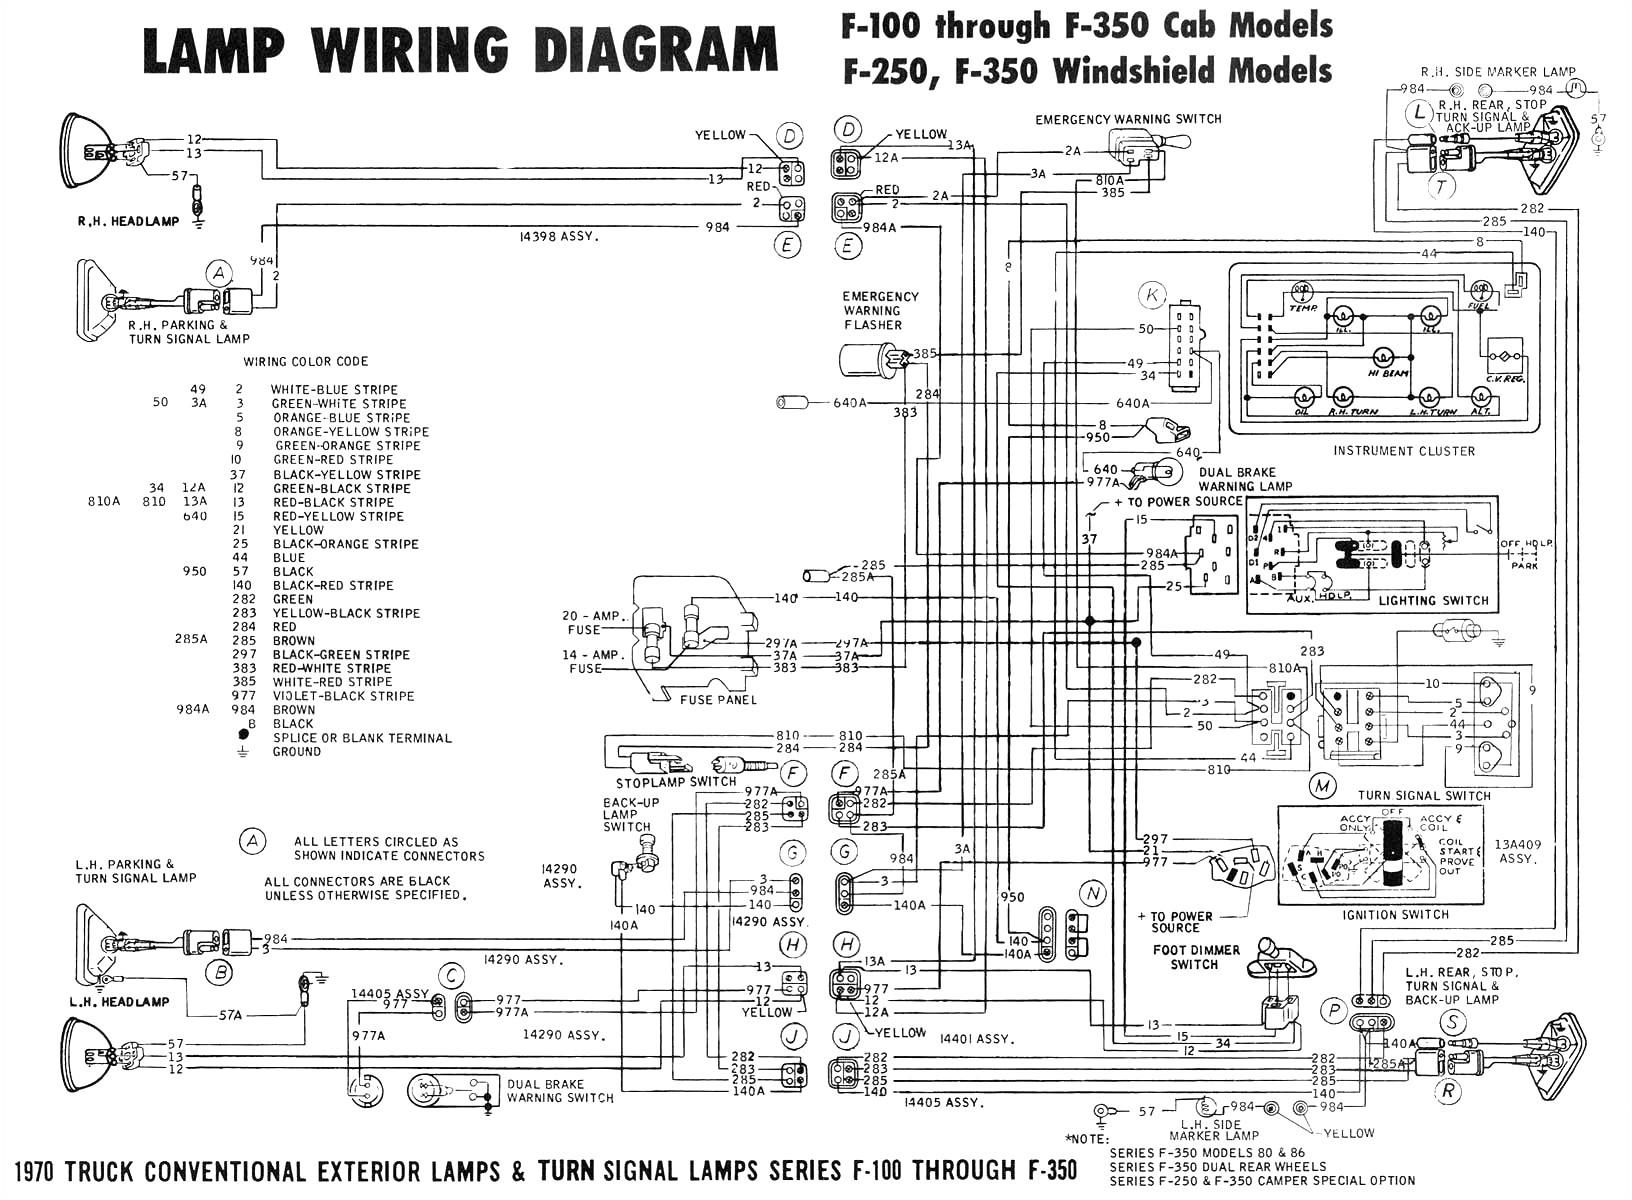 1997 ford f 250 wiring diagram wiring diagram show 97 ford f 350 trailer wiring diagram